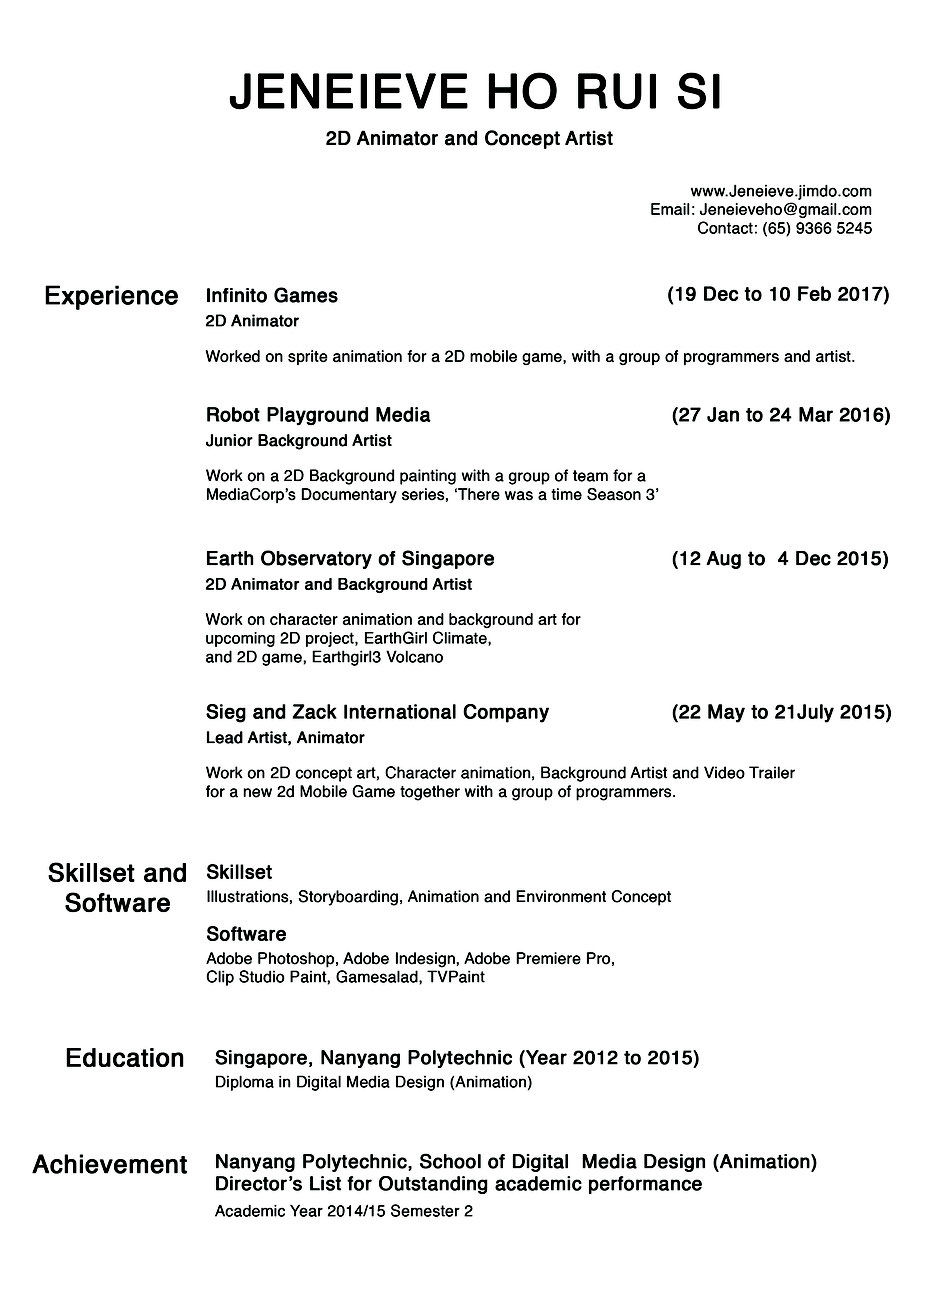 Jeneieve's Resume